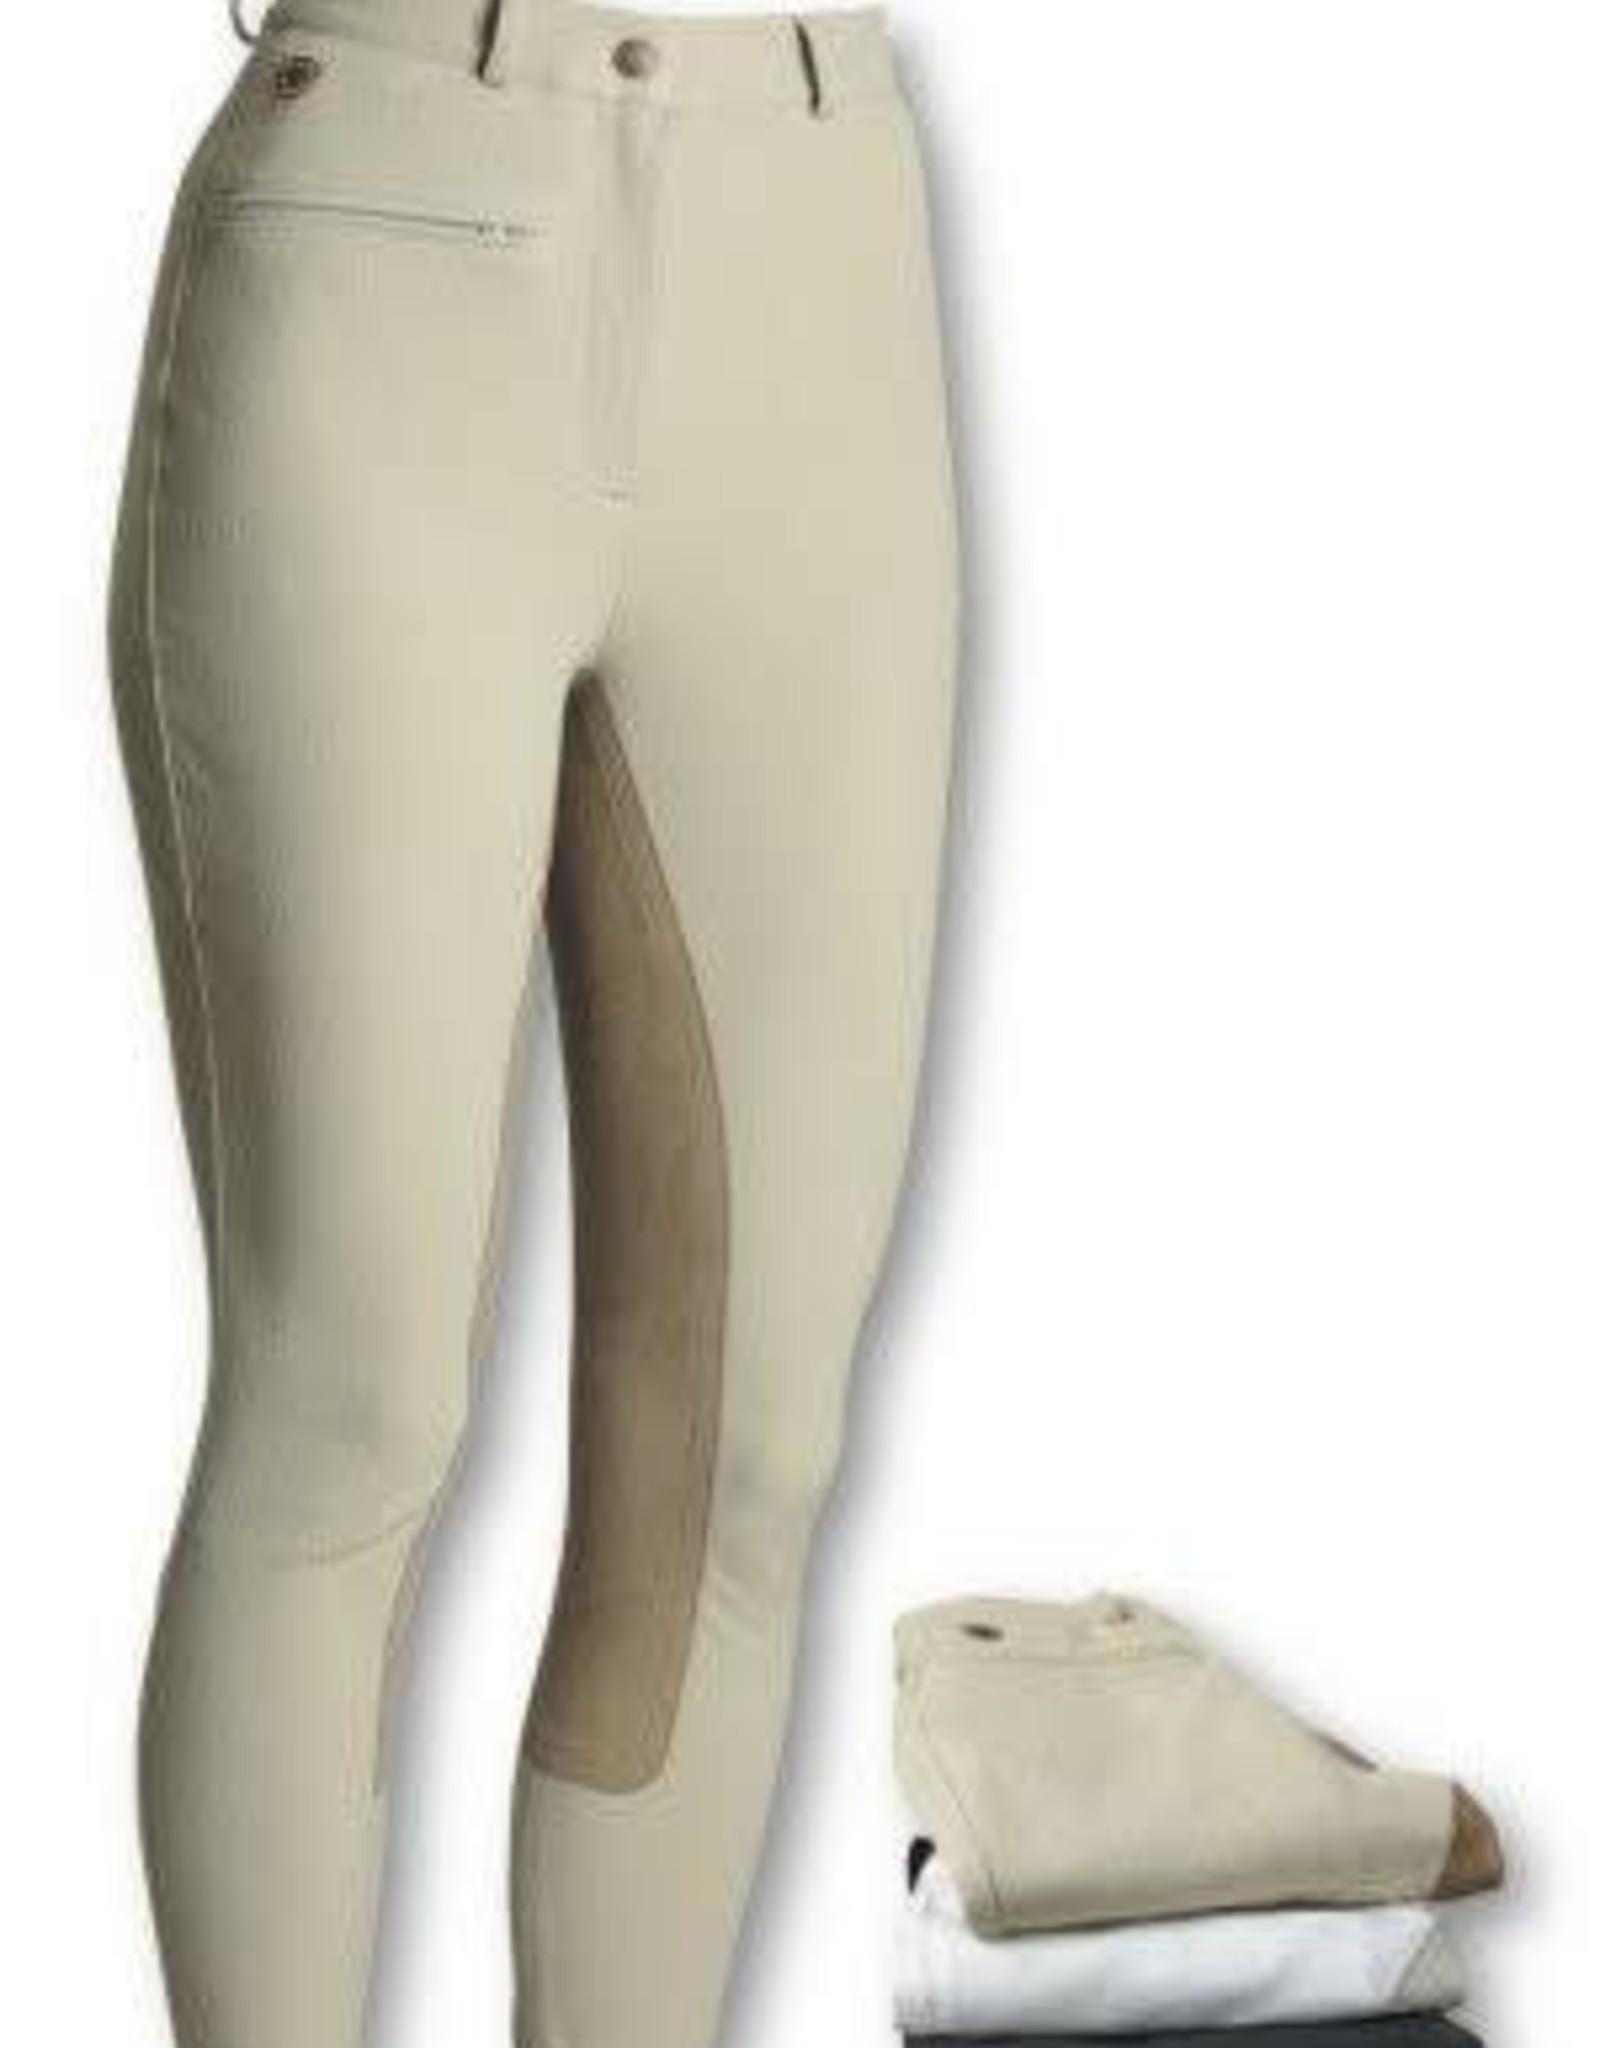 Ariat Ariat Sport Rhythm Breeches - White - Size 26 Long